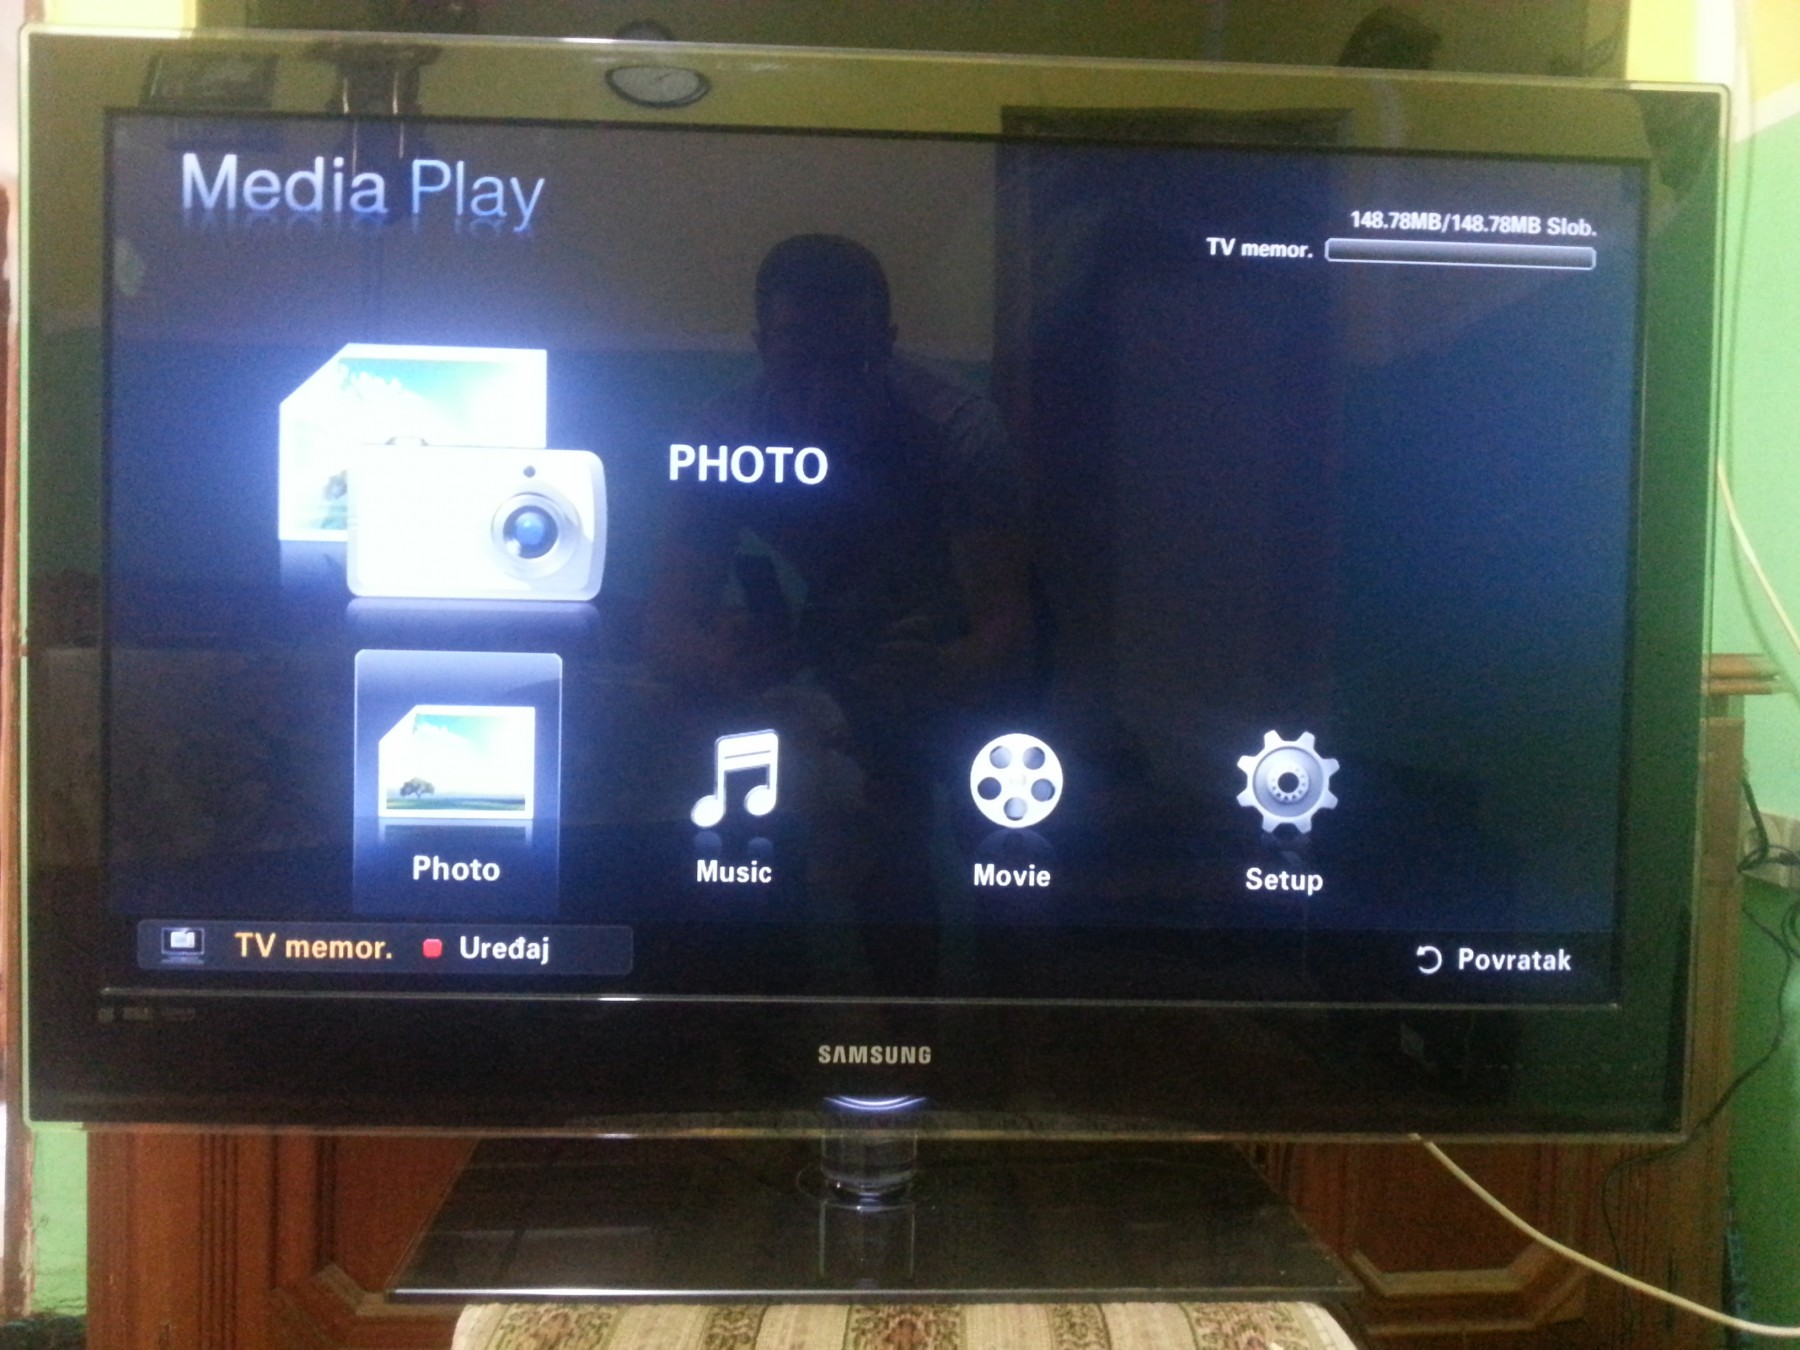 tv samsung 40 inca net tv full hd usb internet 36737697. Black Bedroom Furniture Sets. Home Design Ideas